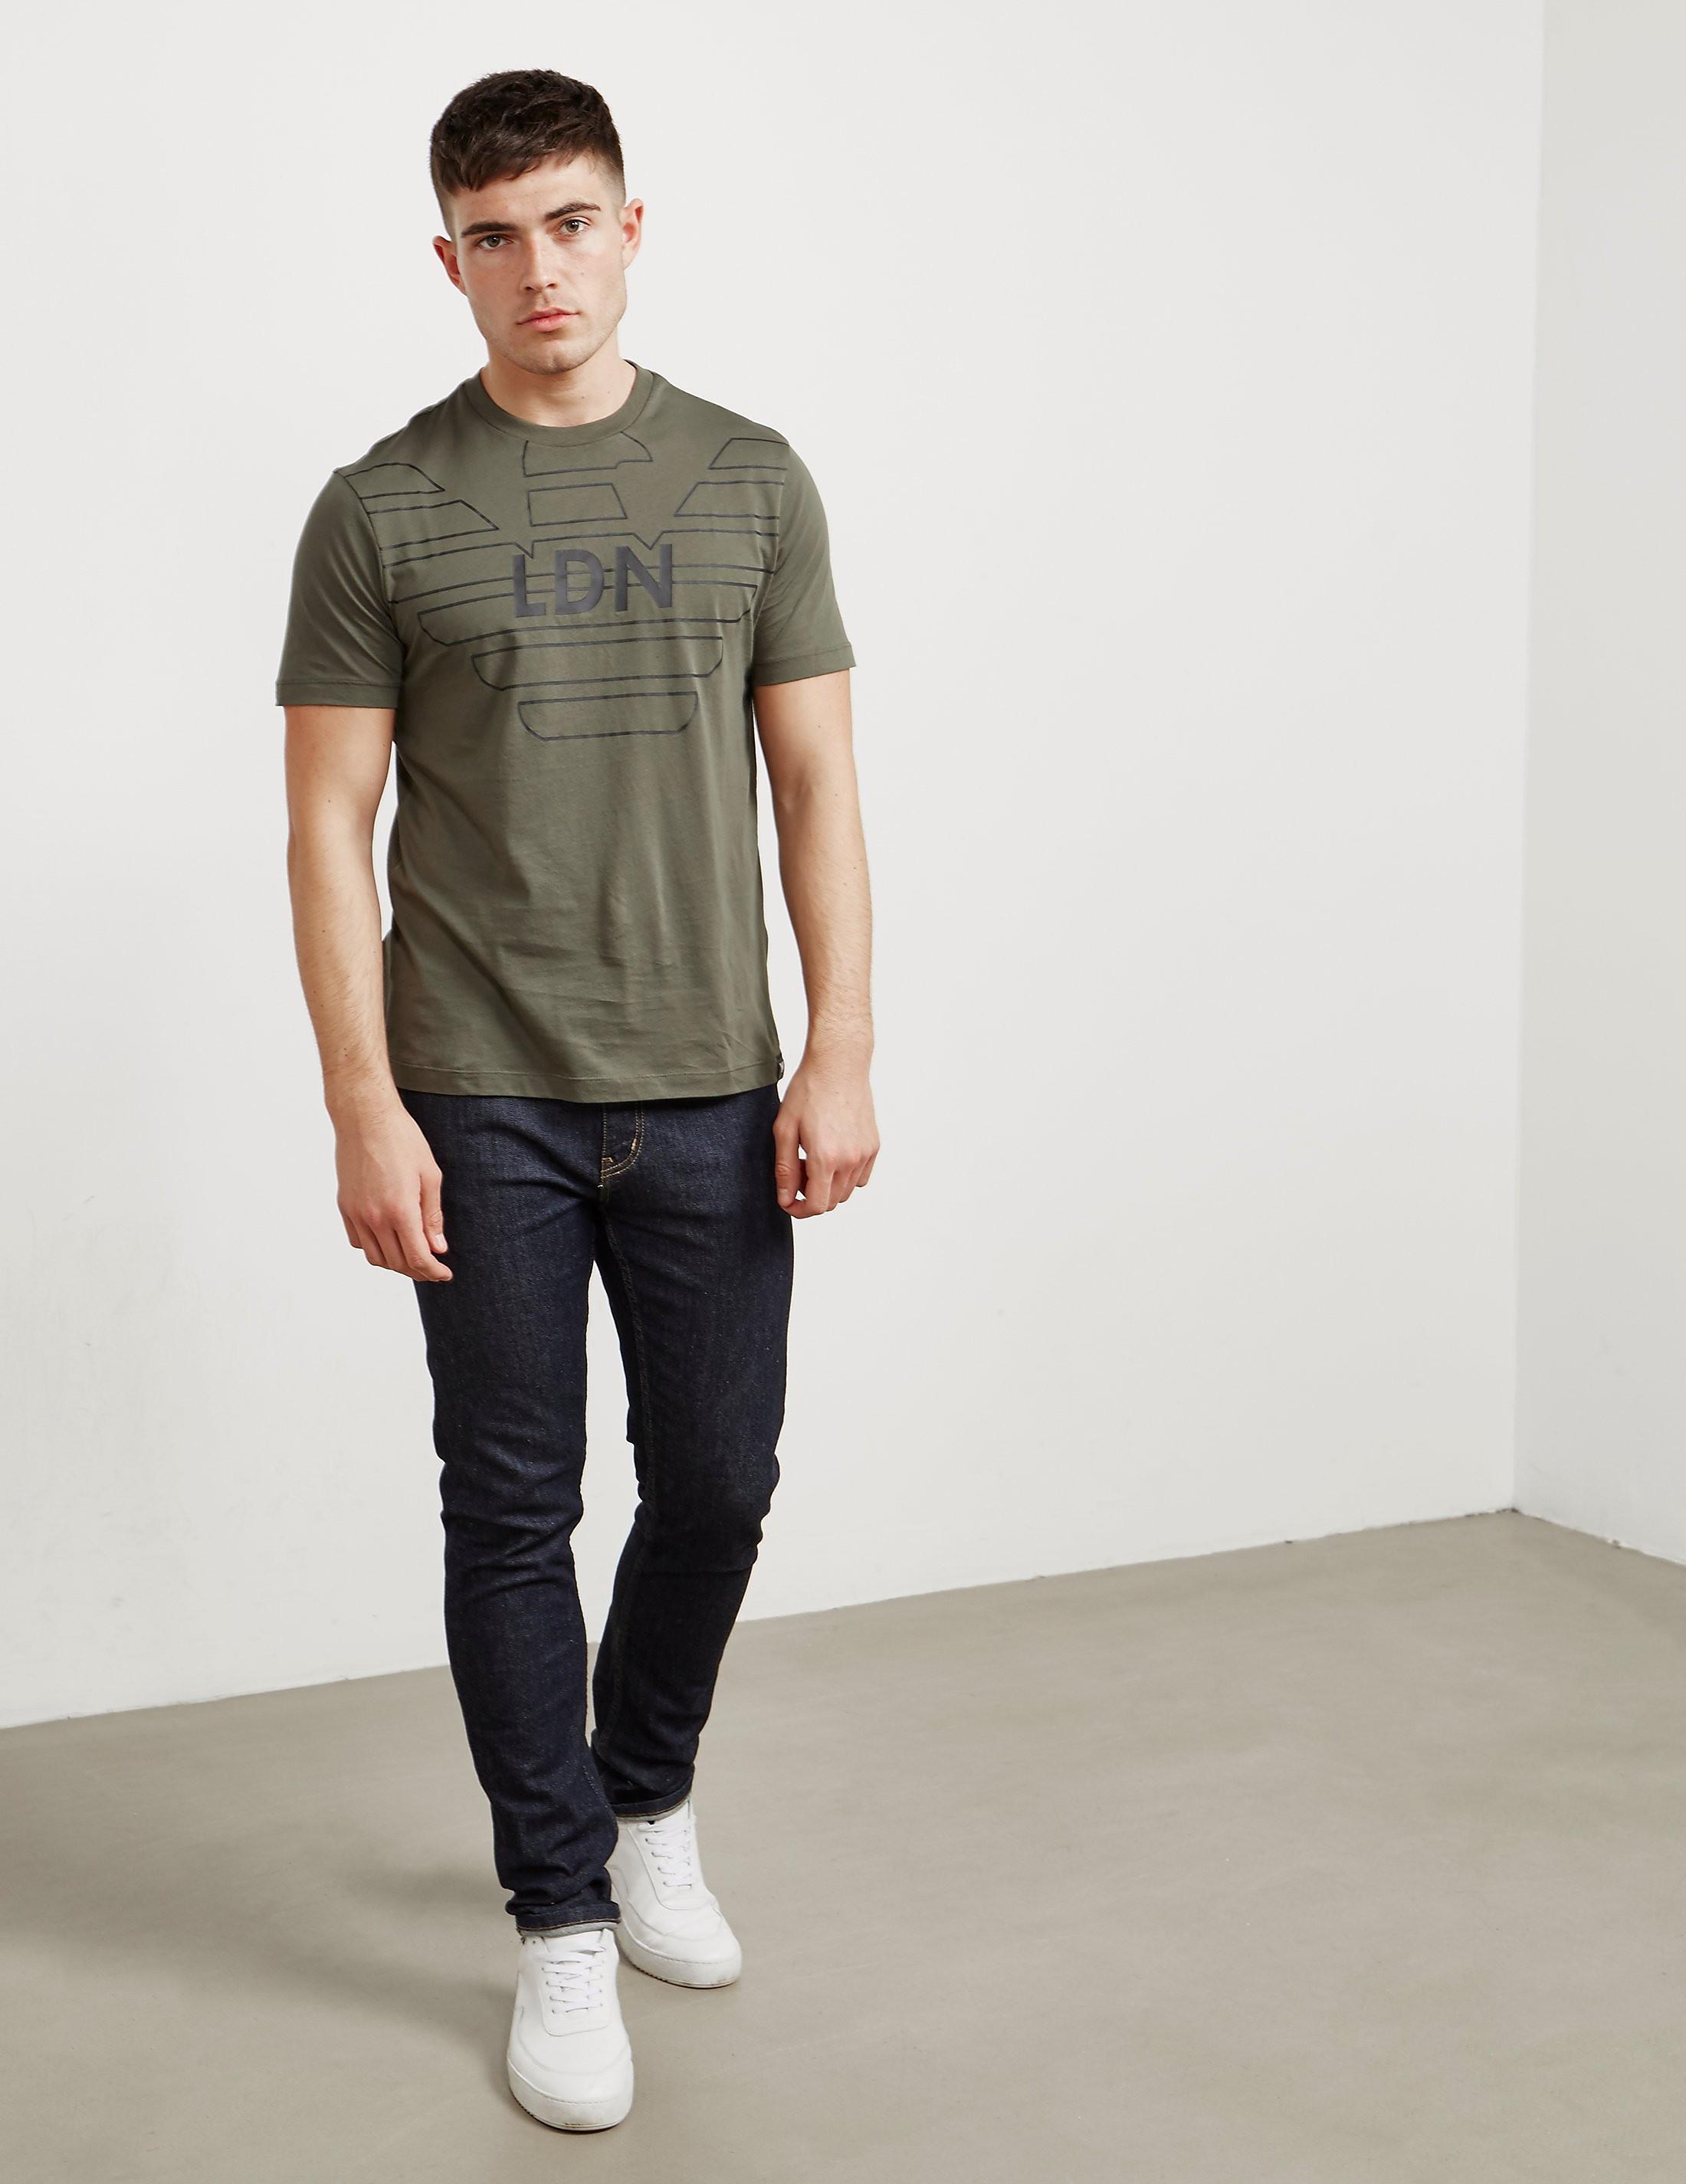 Emporio Armani LDN Eagle Short Sleeve T-Shirt